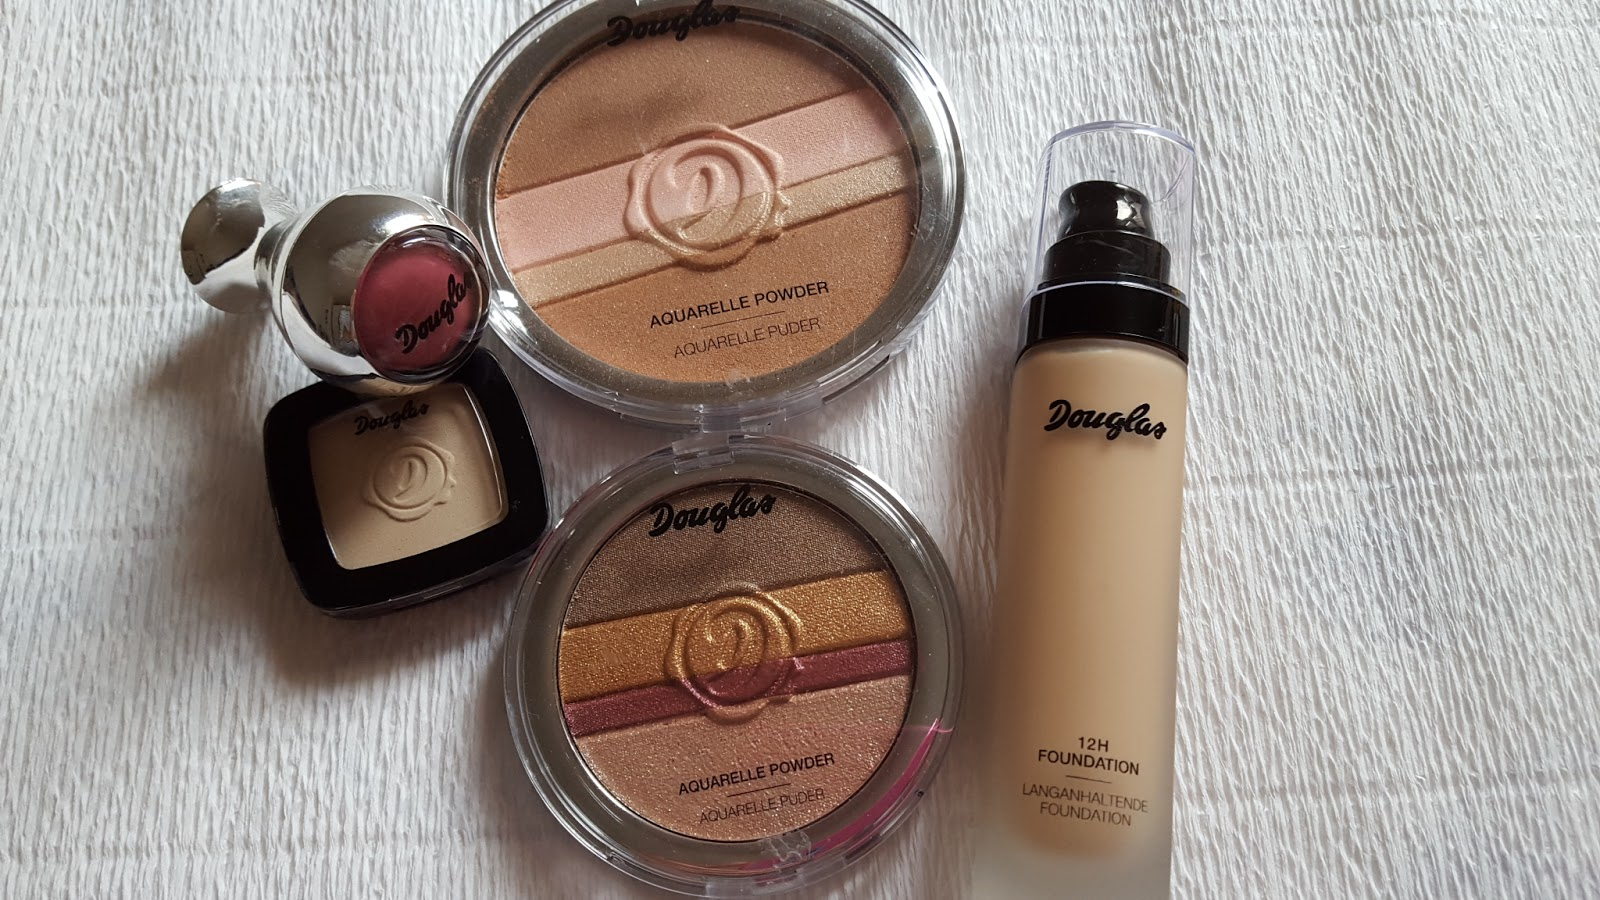 Douglas makeup - recensione e swatches